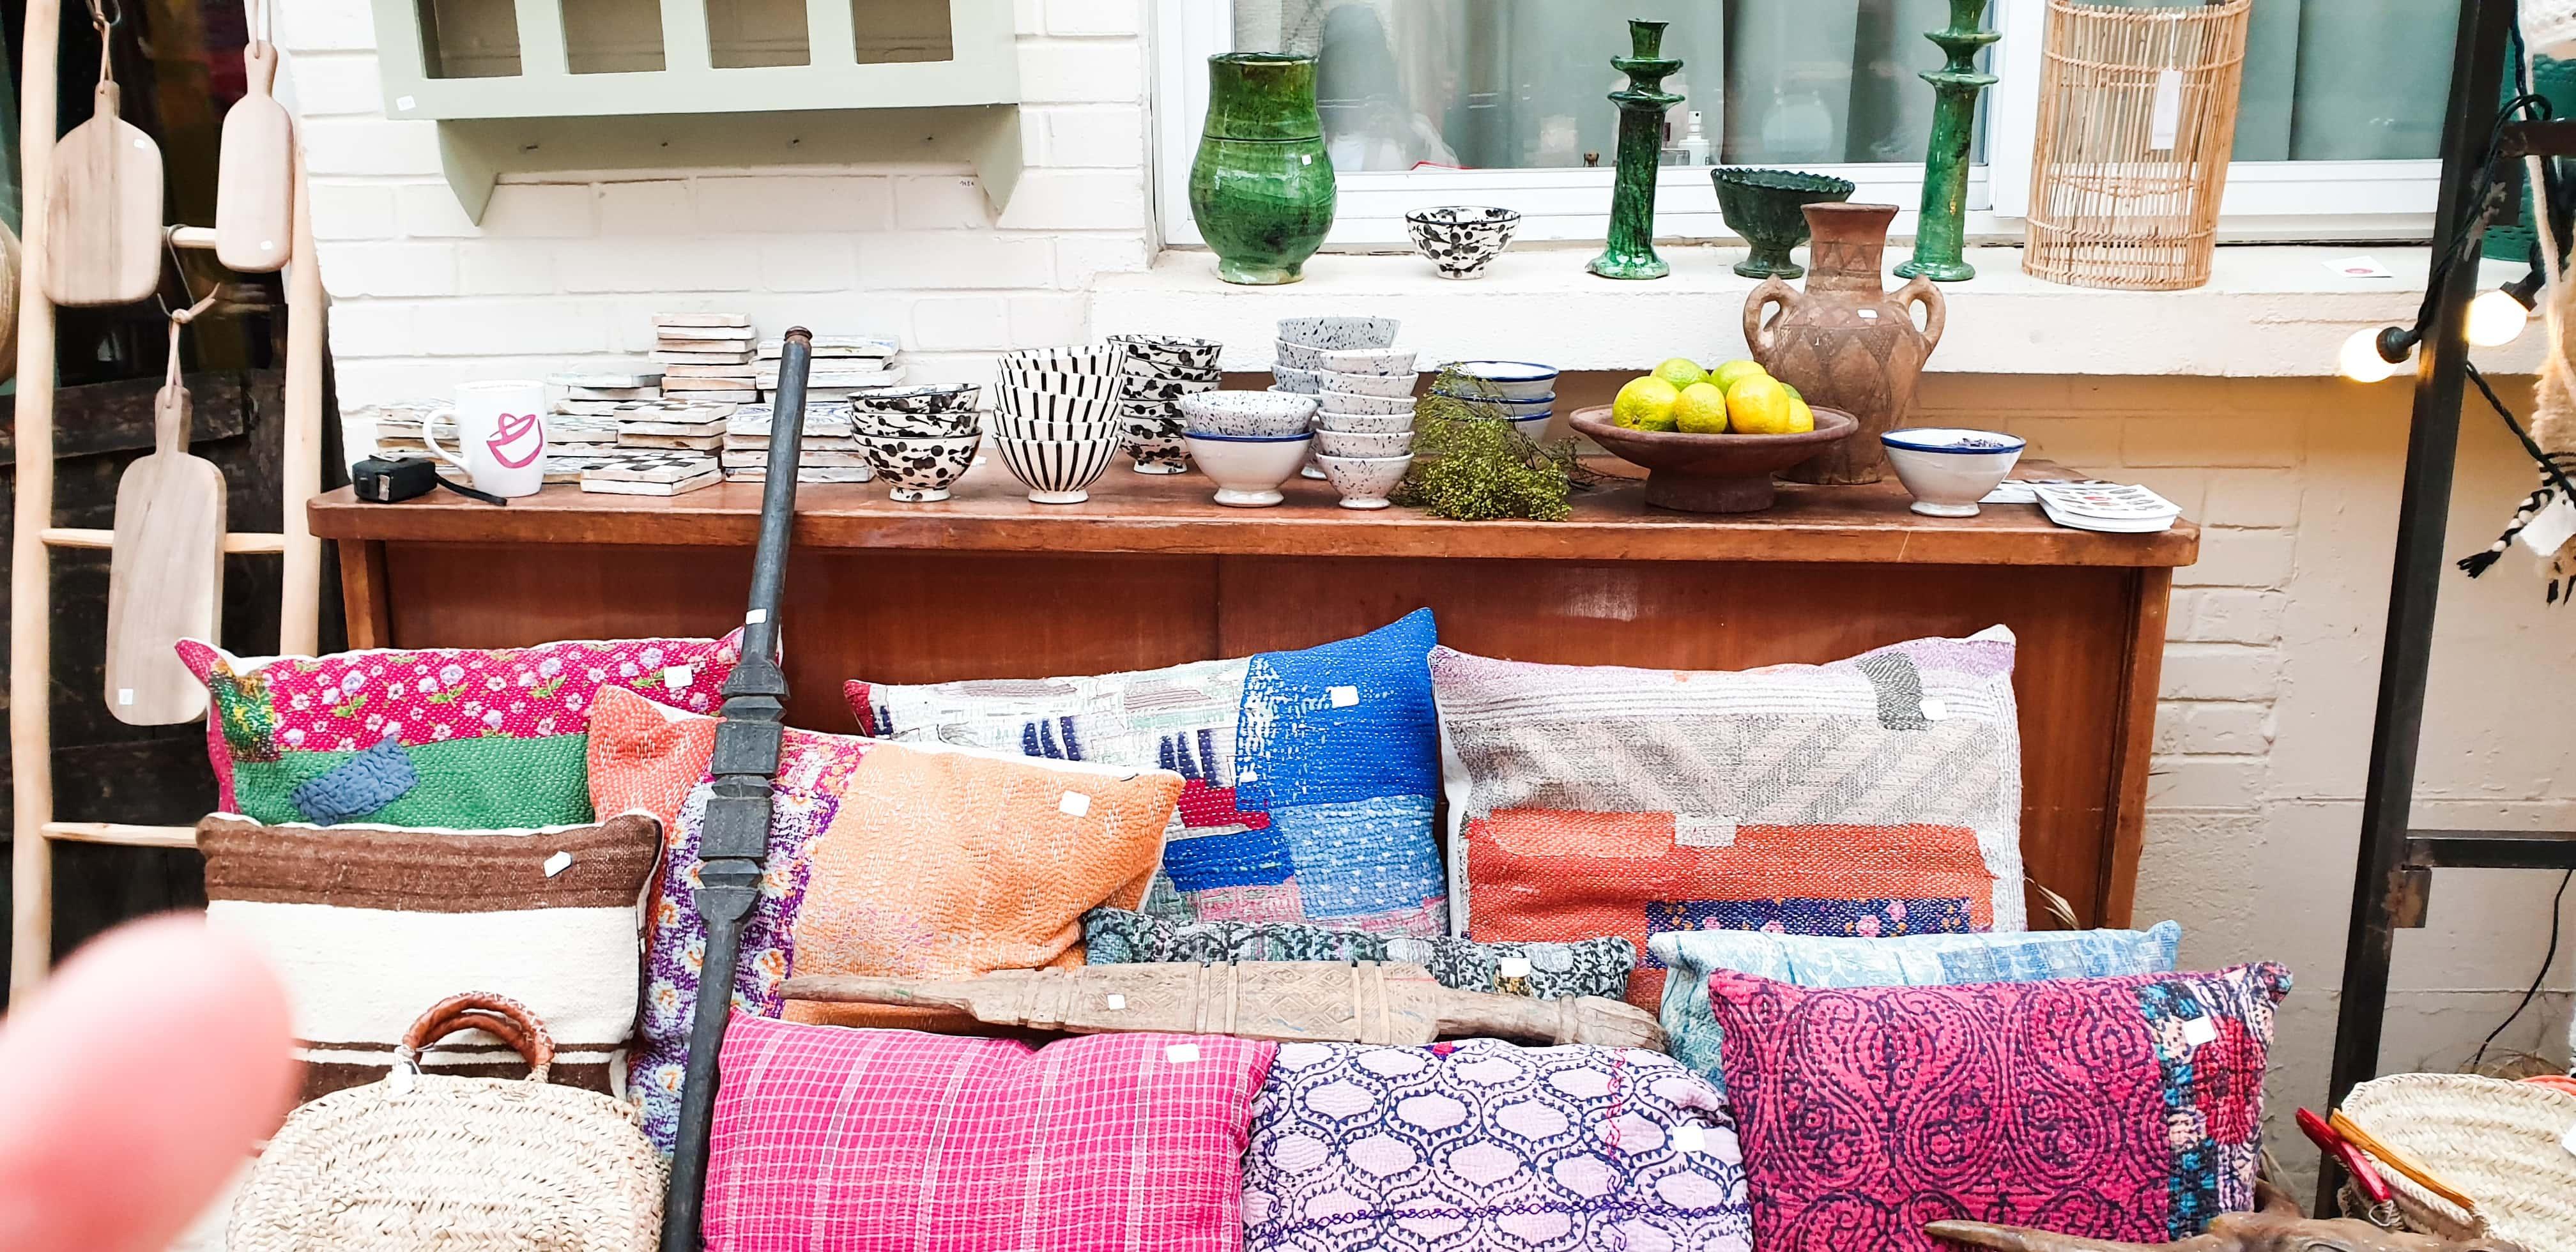 ROUGE HORIZON Clamart, artisanat marocain